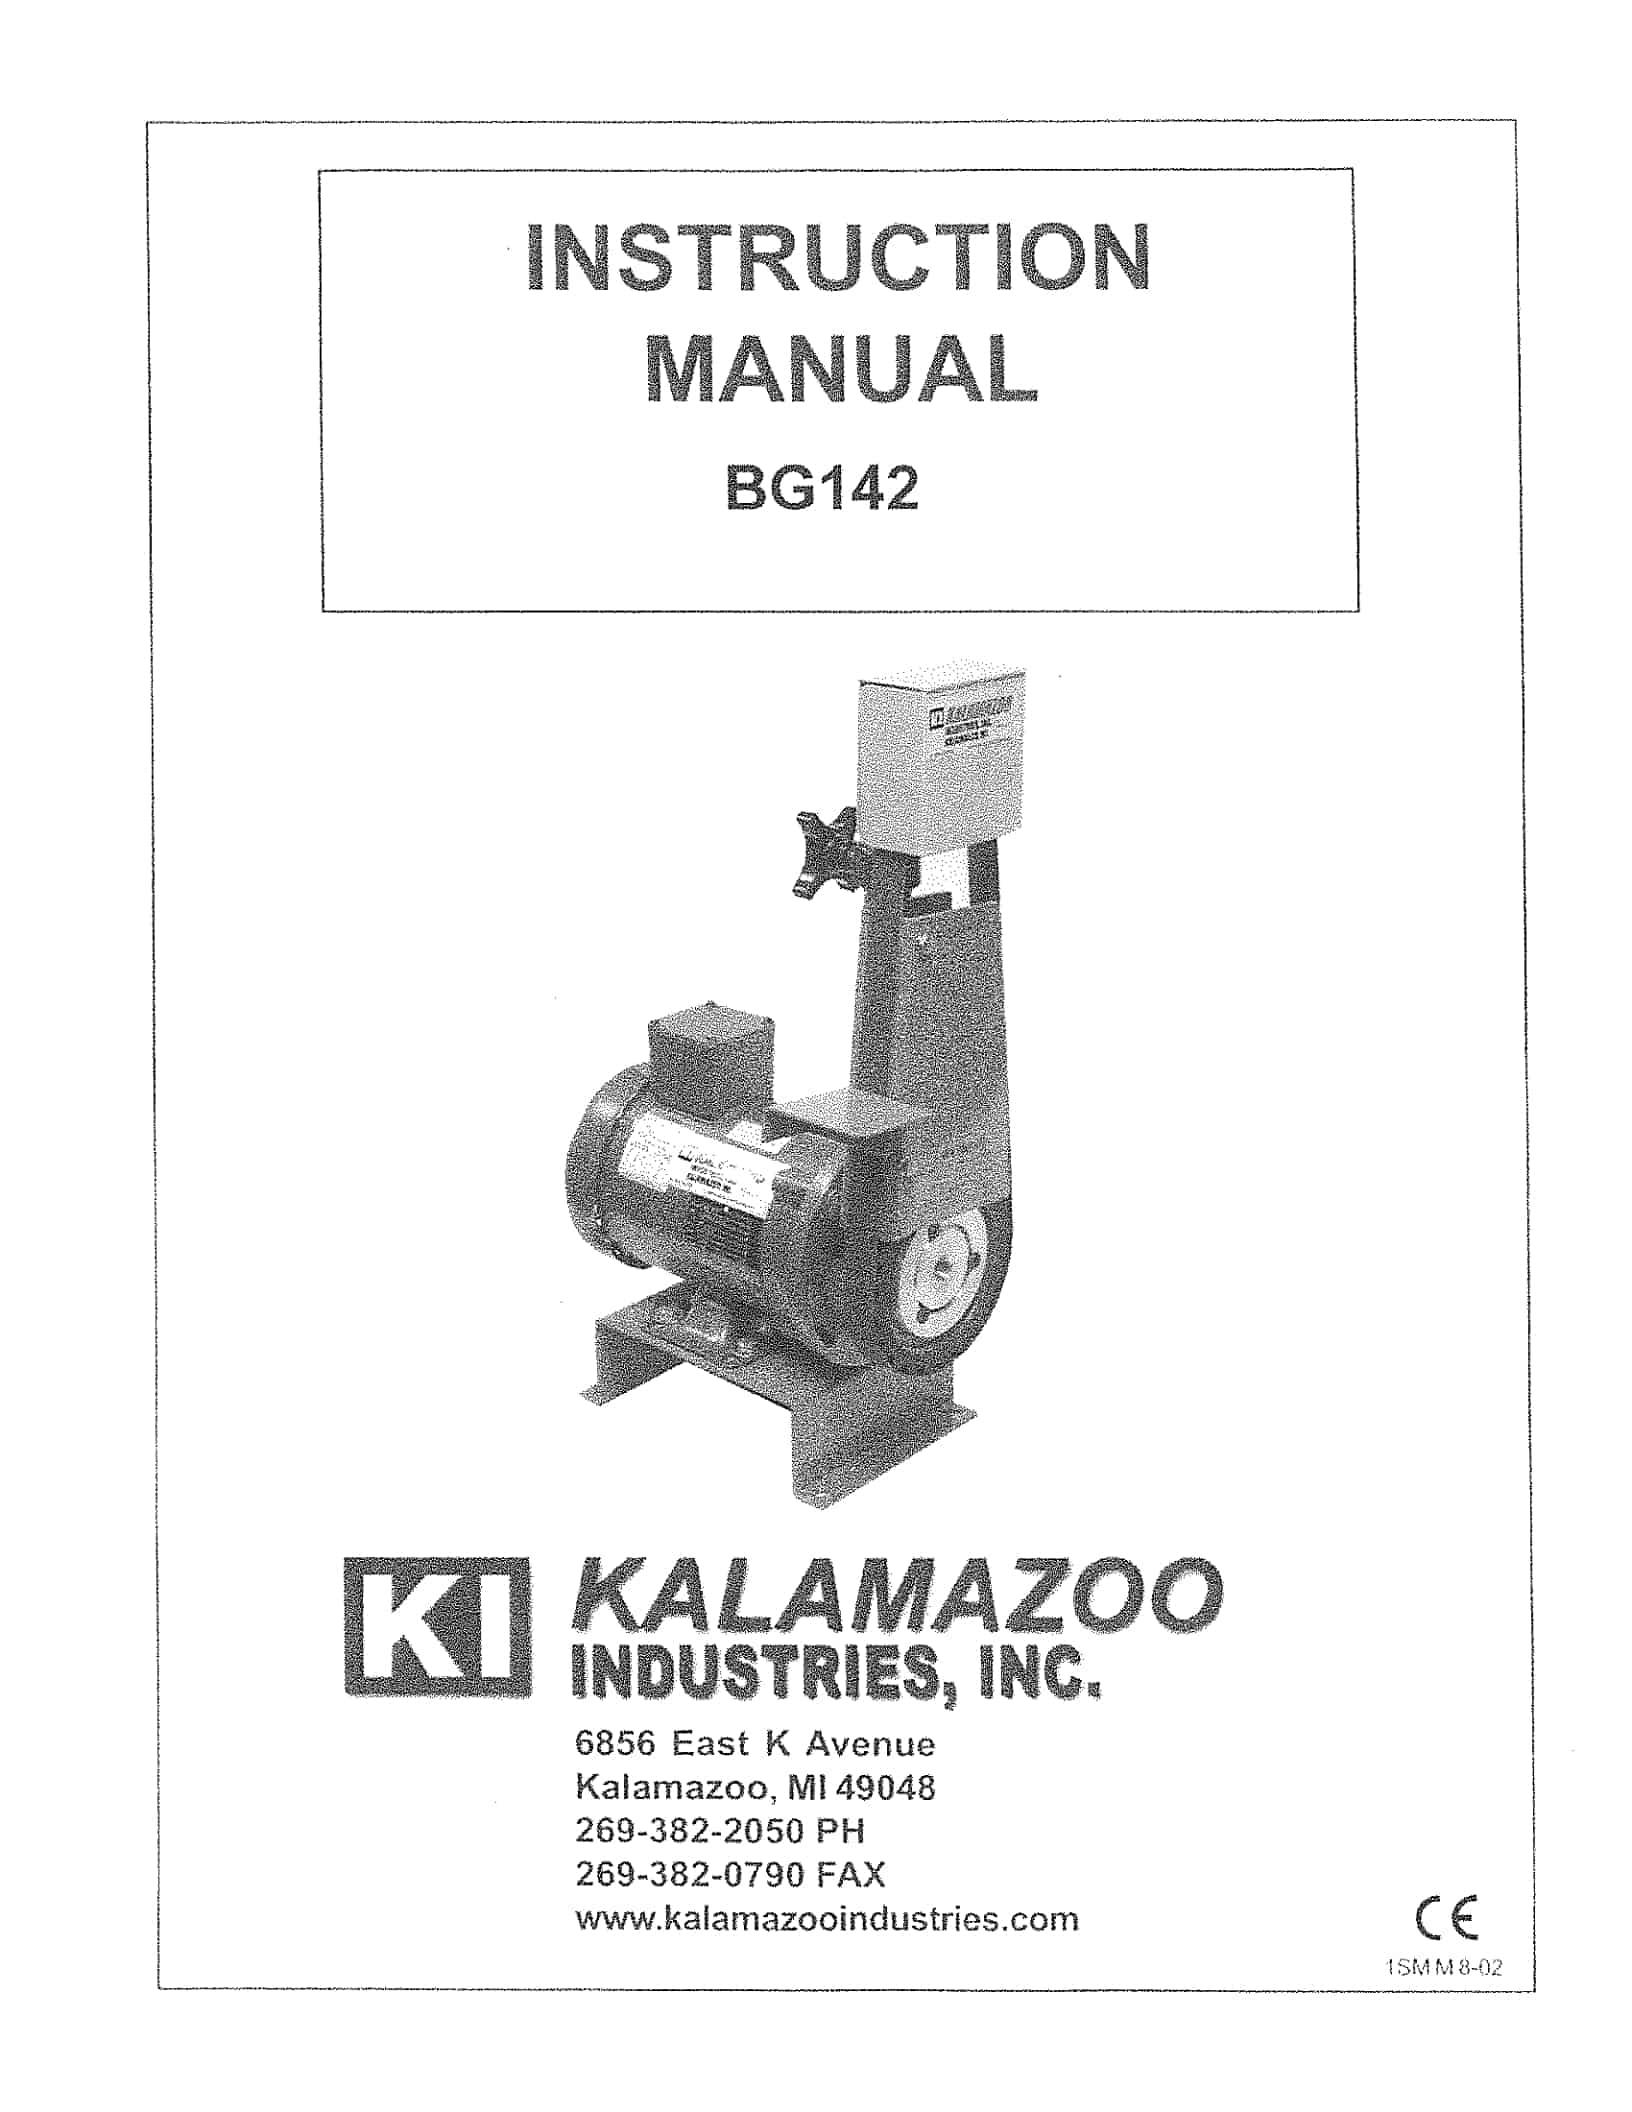 BG142 1 x 42 inch belt grinder manual